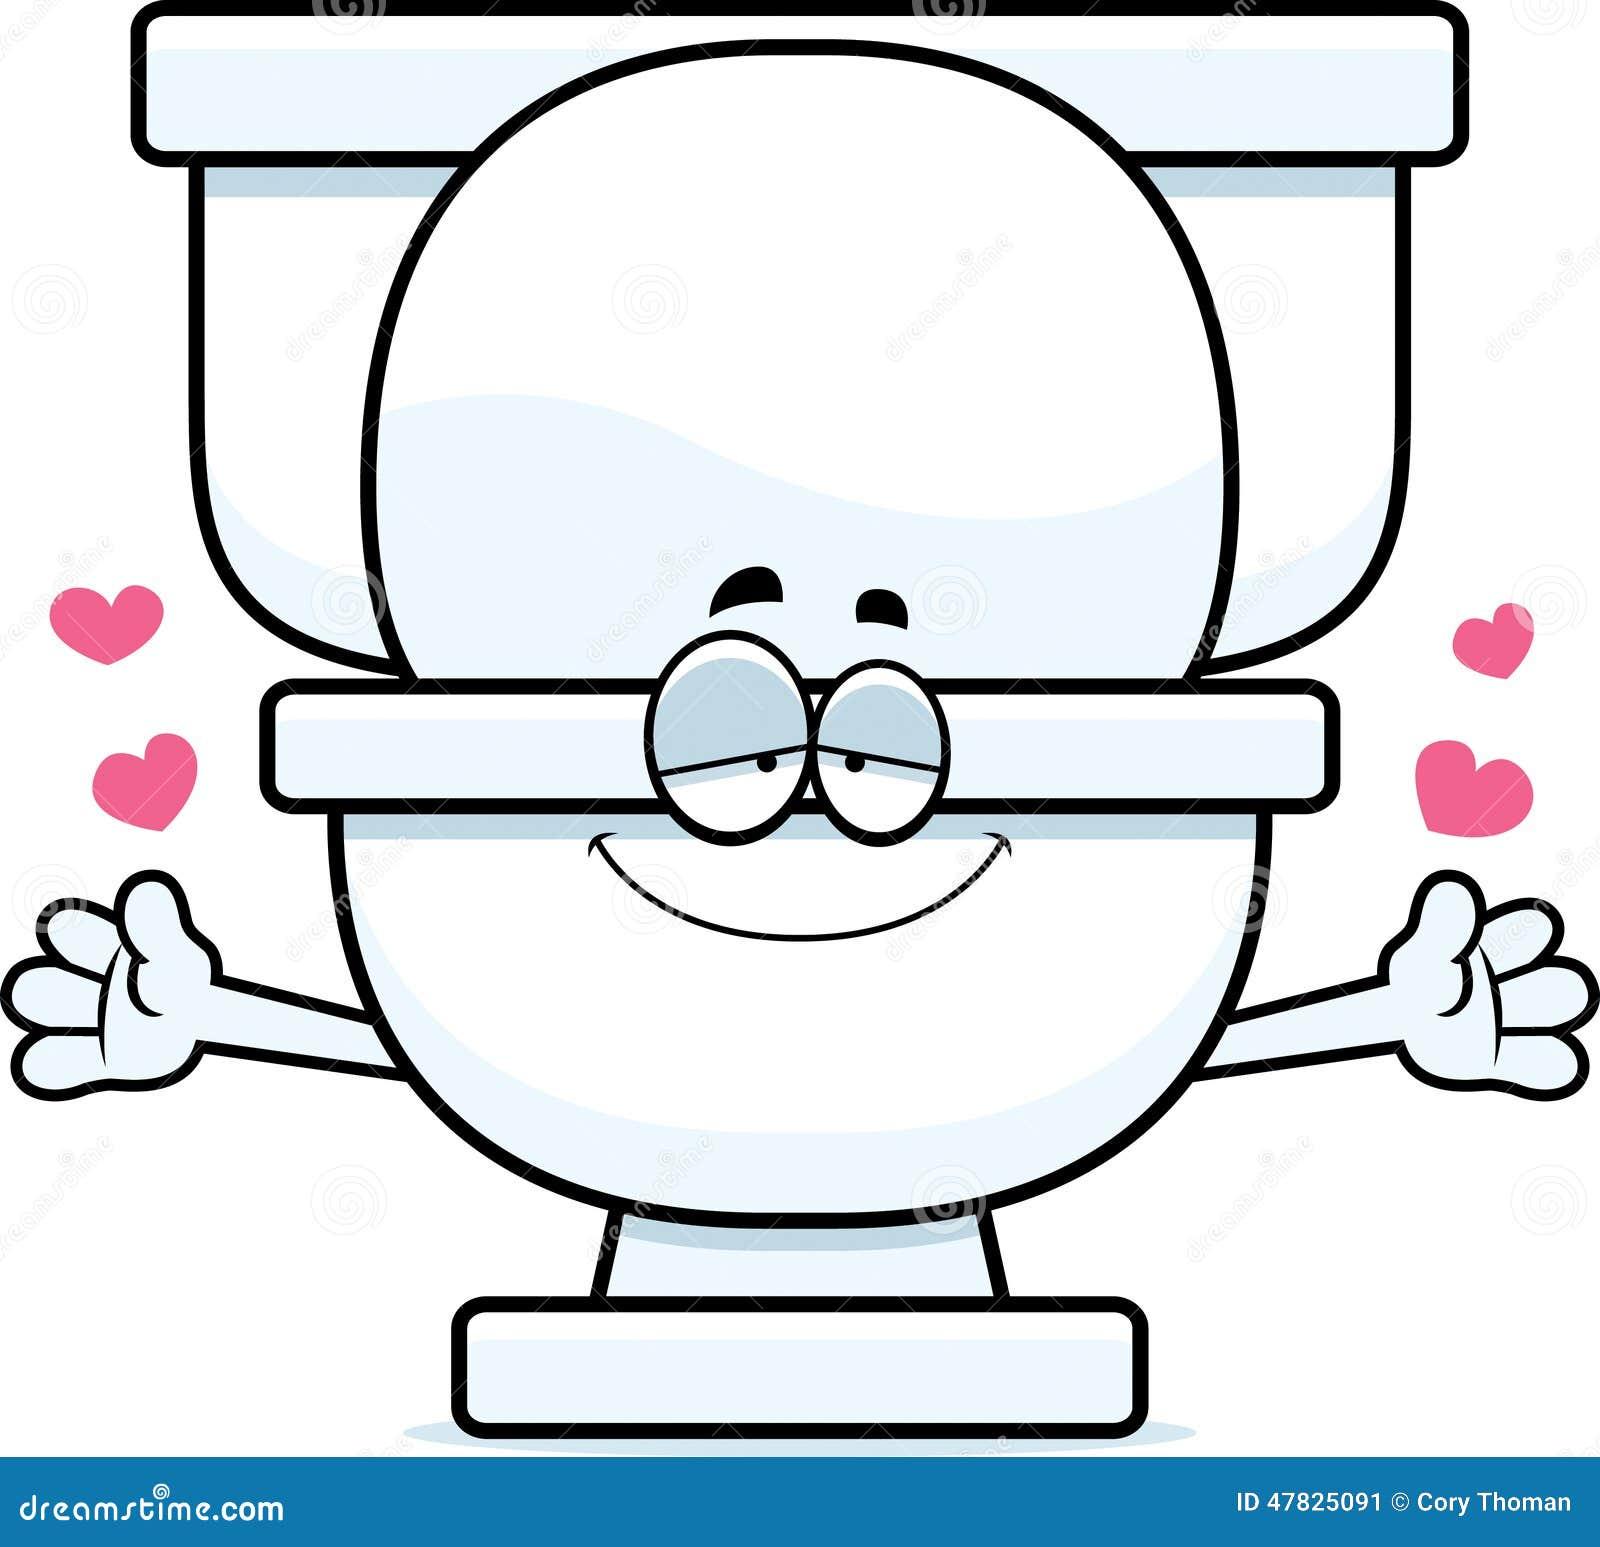 Design Your Bathroom Cartoon Toilet Hug Stock Vector Image 47825091